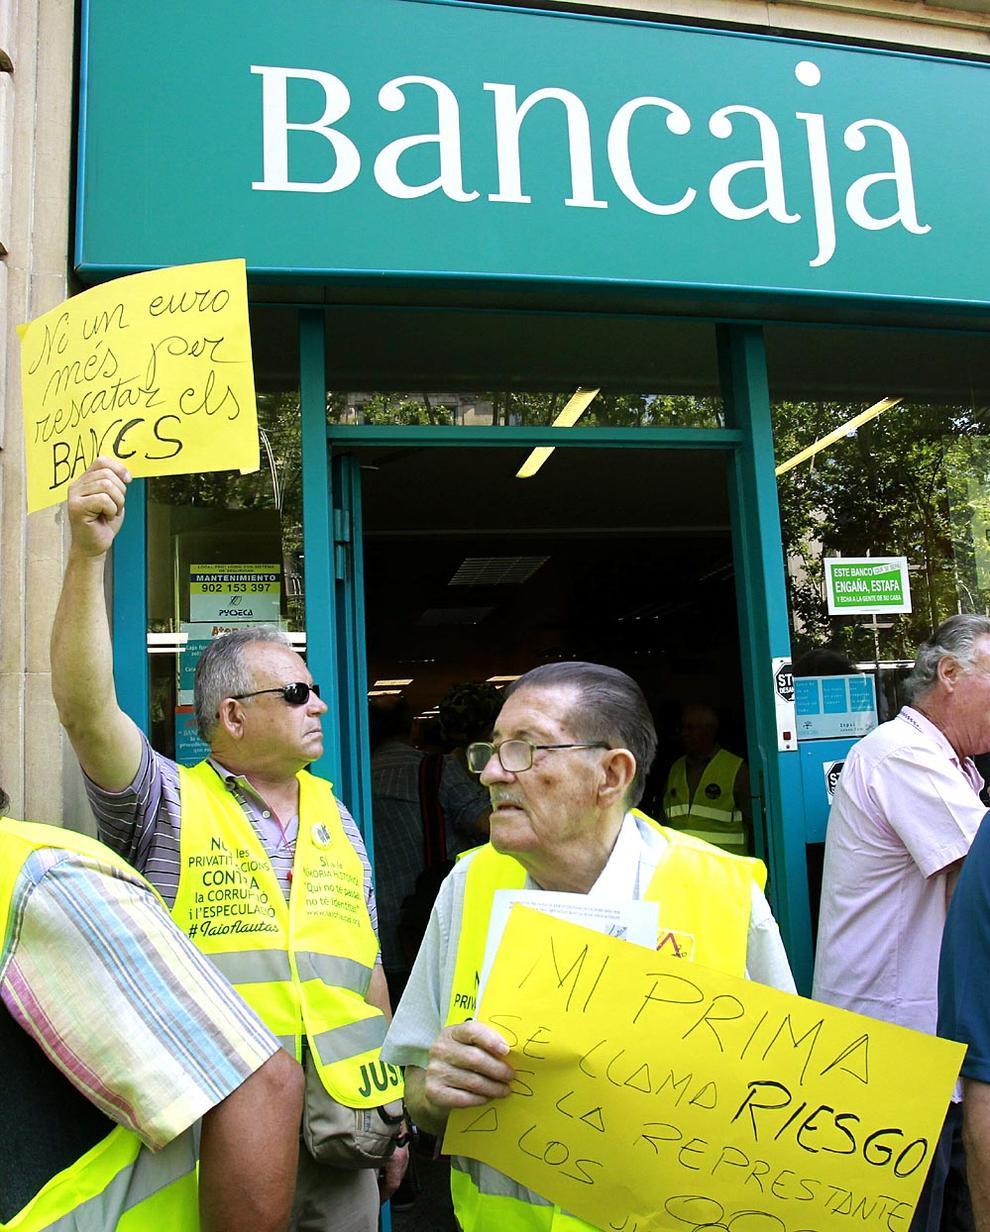 Galer a los yayoflautas protestan contra bankia for Inmobiliaria bancaja